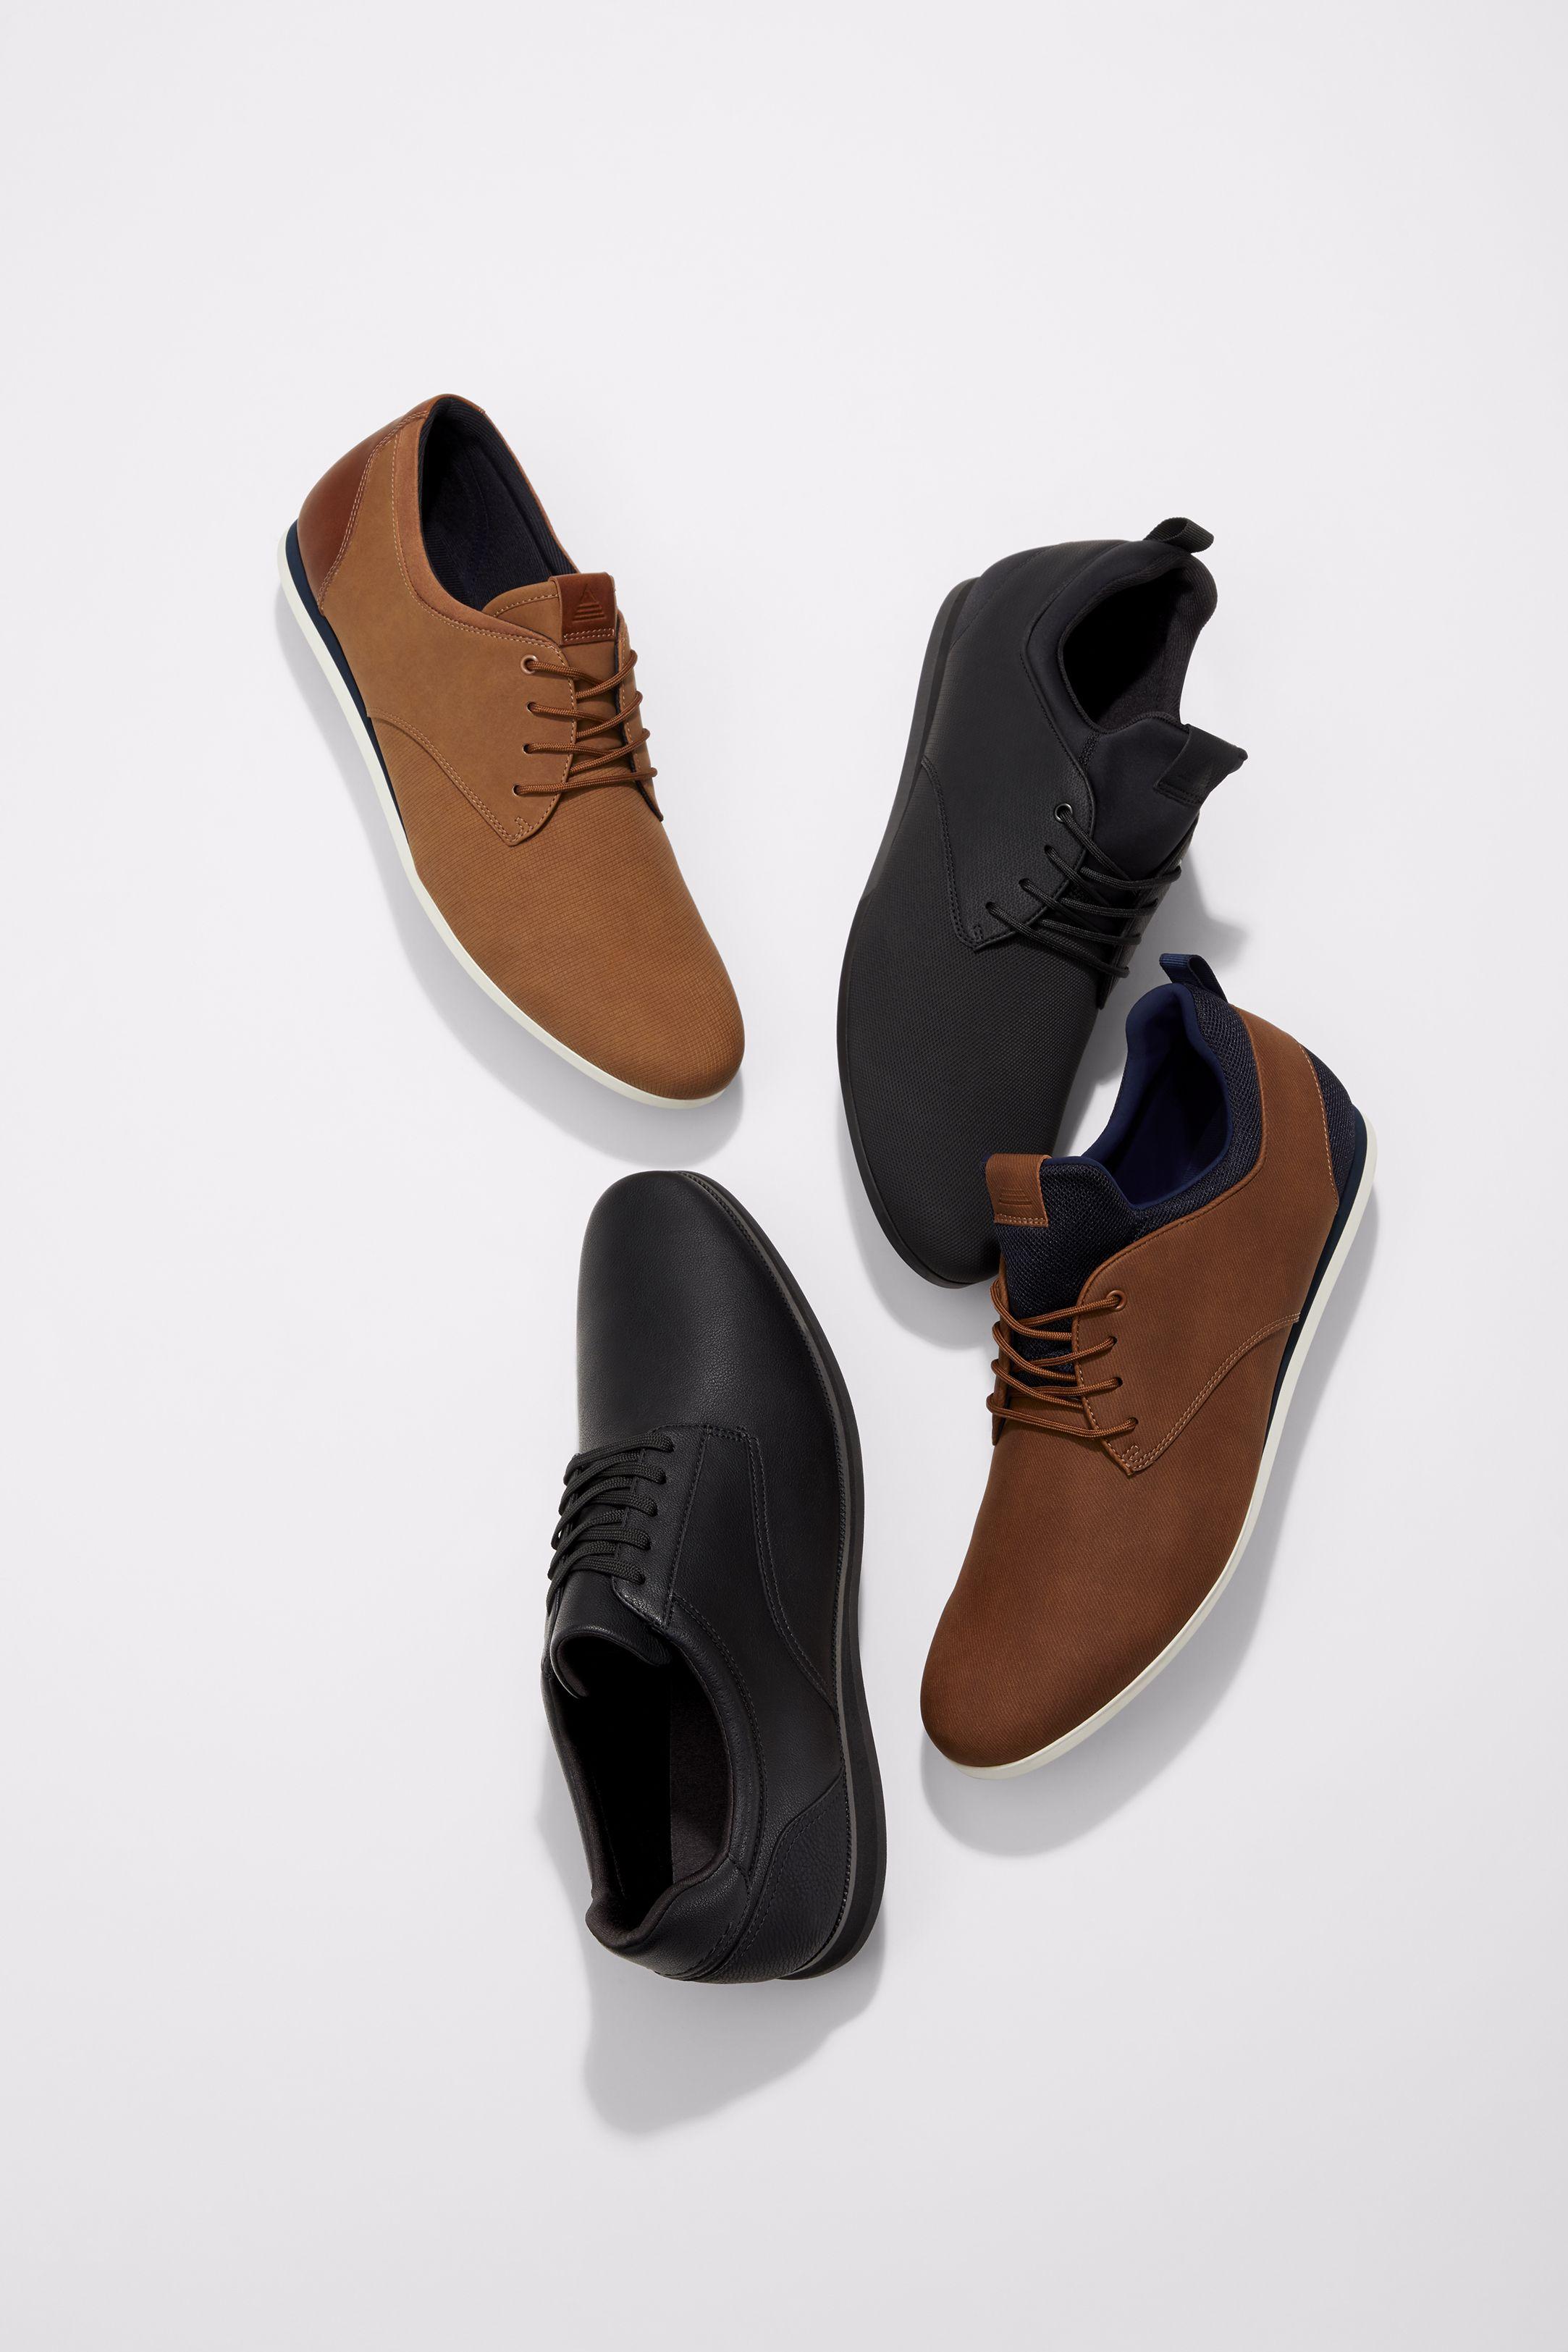 Boat shoes mens, Mens sneakers casual